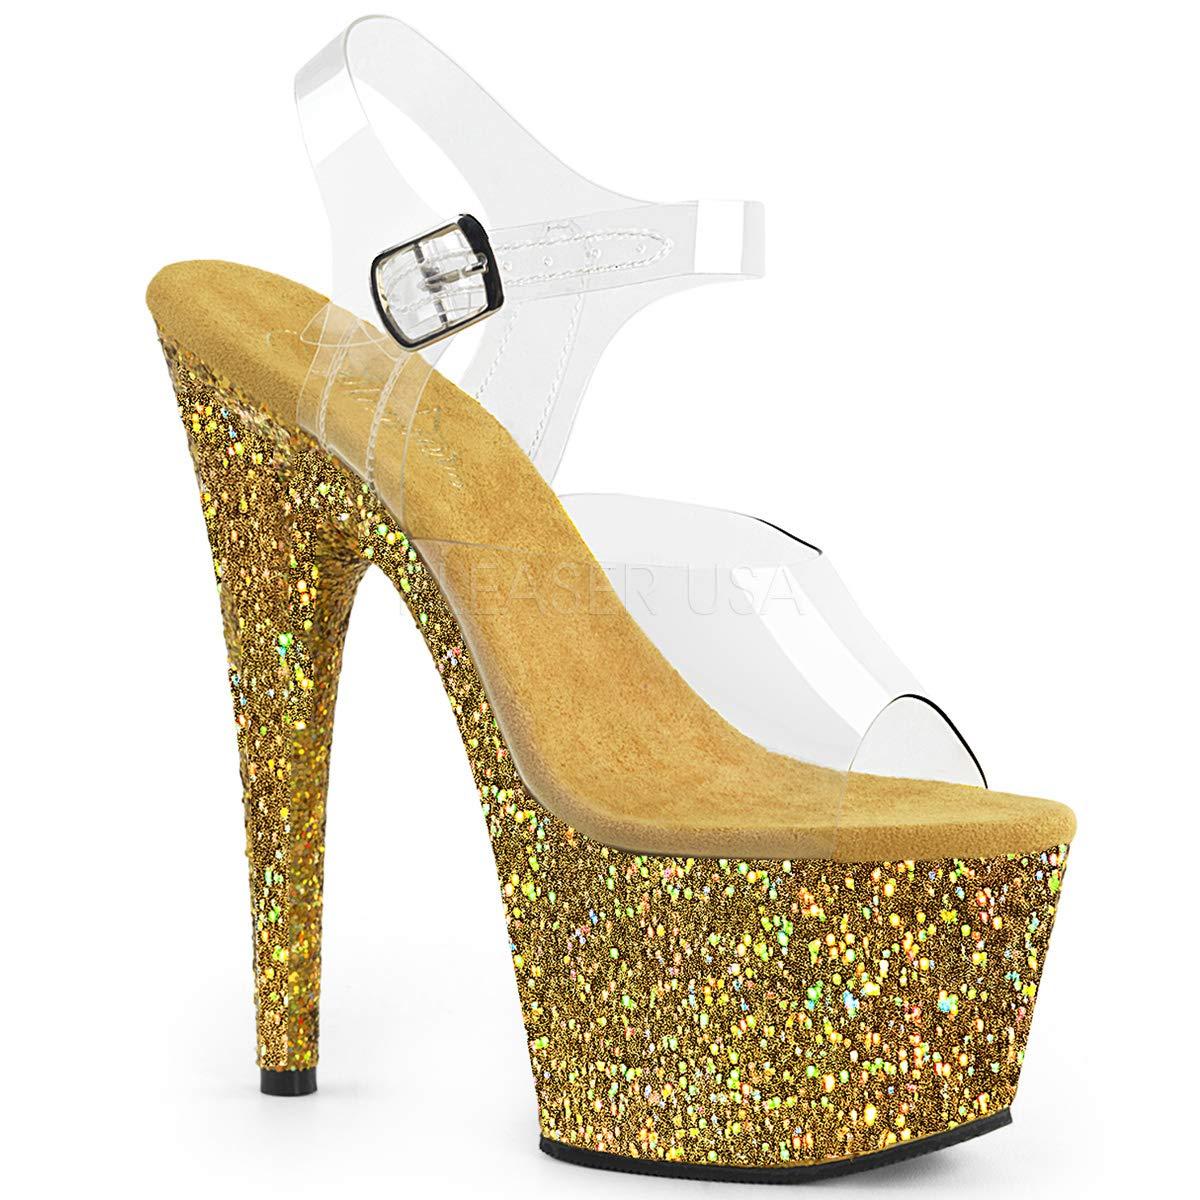 Women's Adore Clear Open Toe Top Gold Glitter Platform Sandals - DeluxeAdultCostumes.com